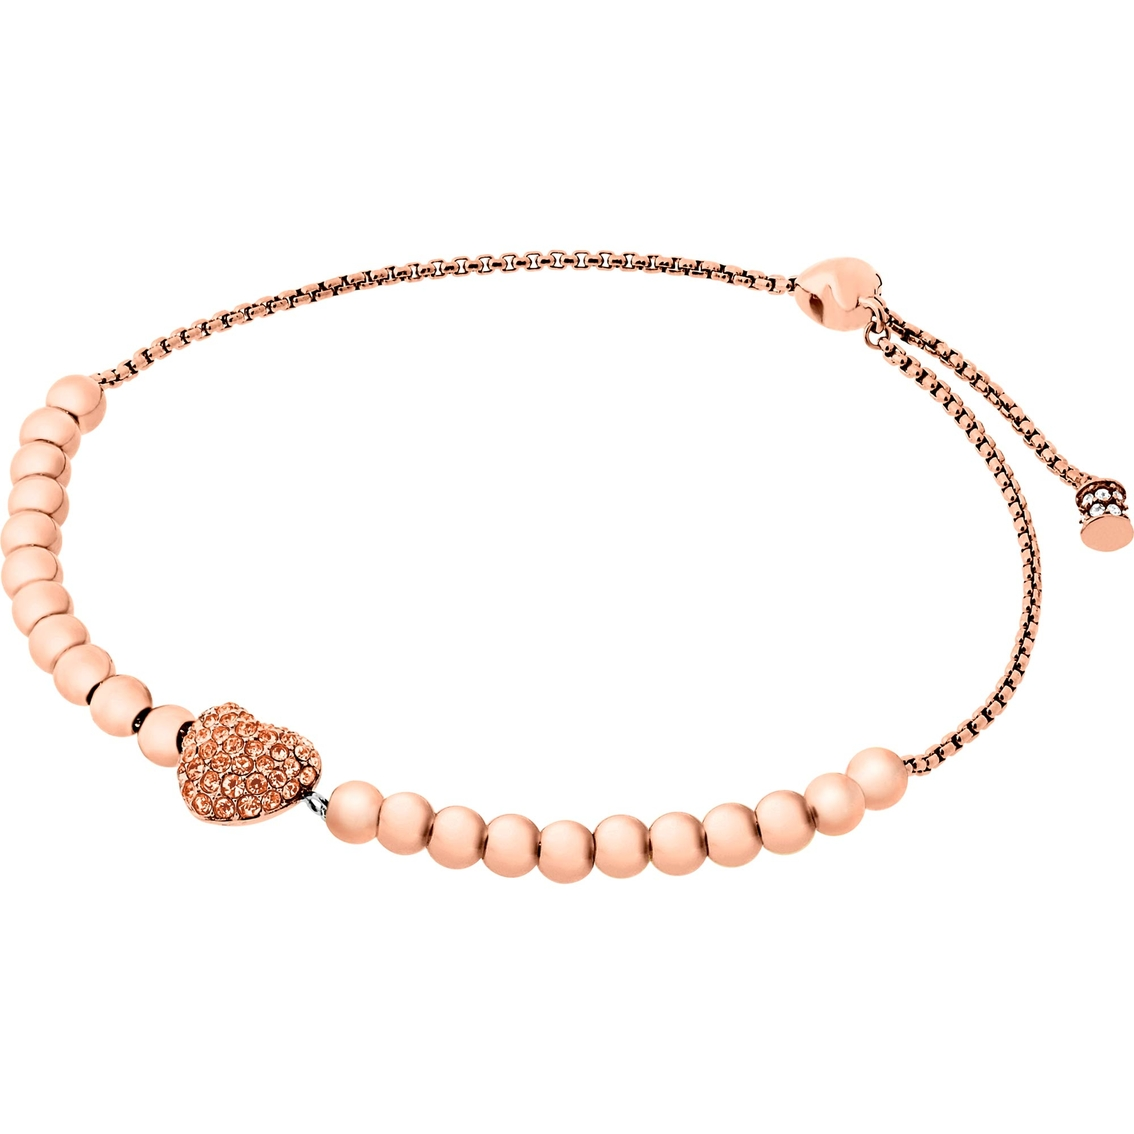 dfa967ca06713 Michael Kors Pave Hearts Crystal Bead Slider Bracelet